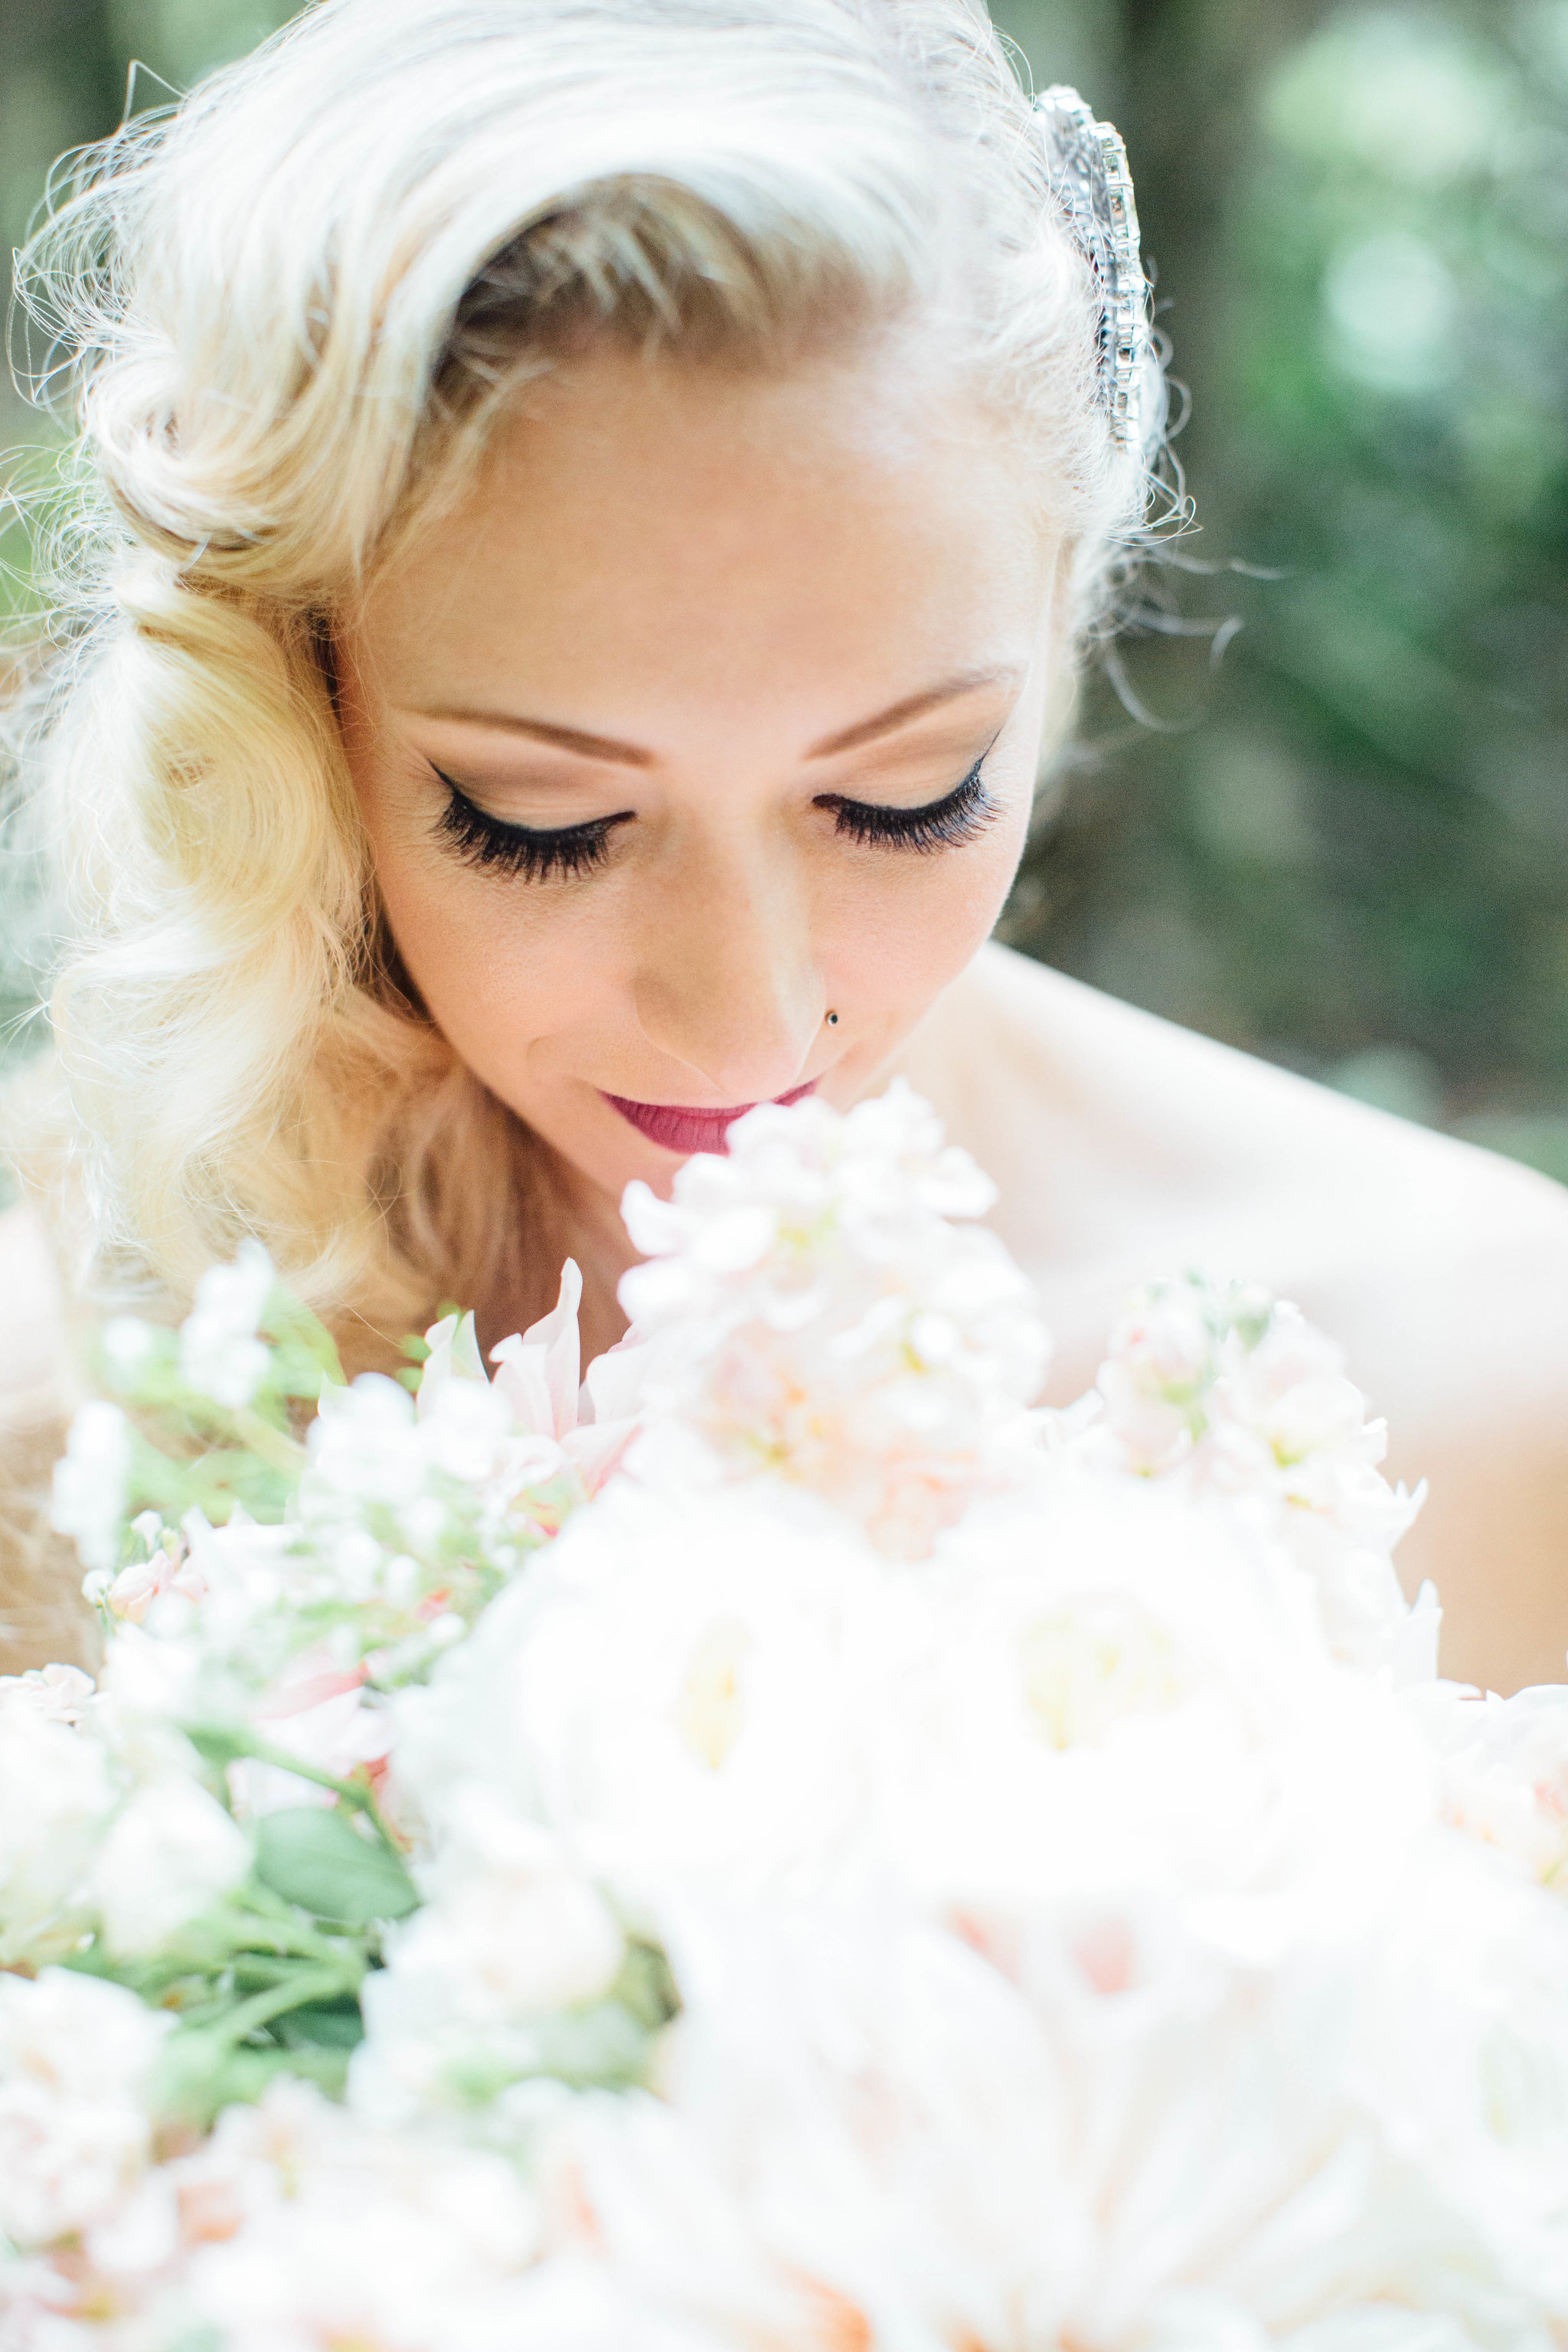 bellingham-wedding-backayard-by-seattle-wedding-photographer-adina-preston-20.jpg